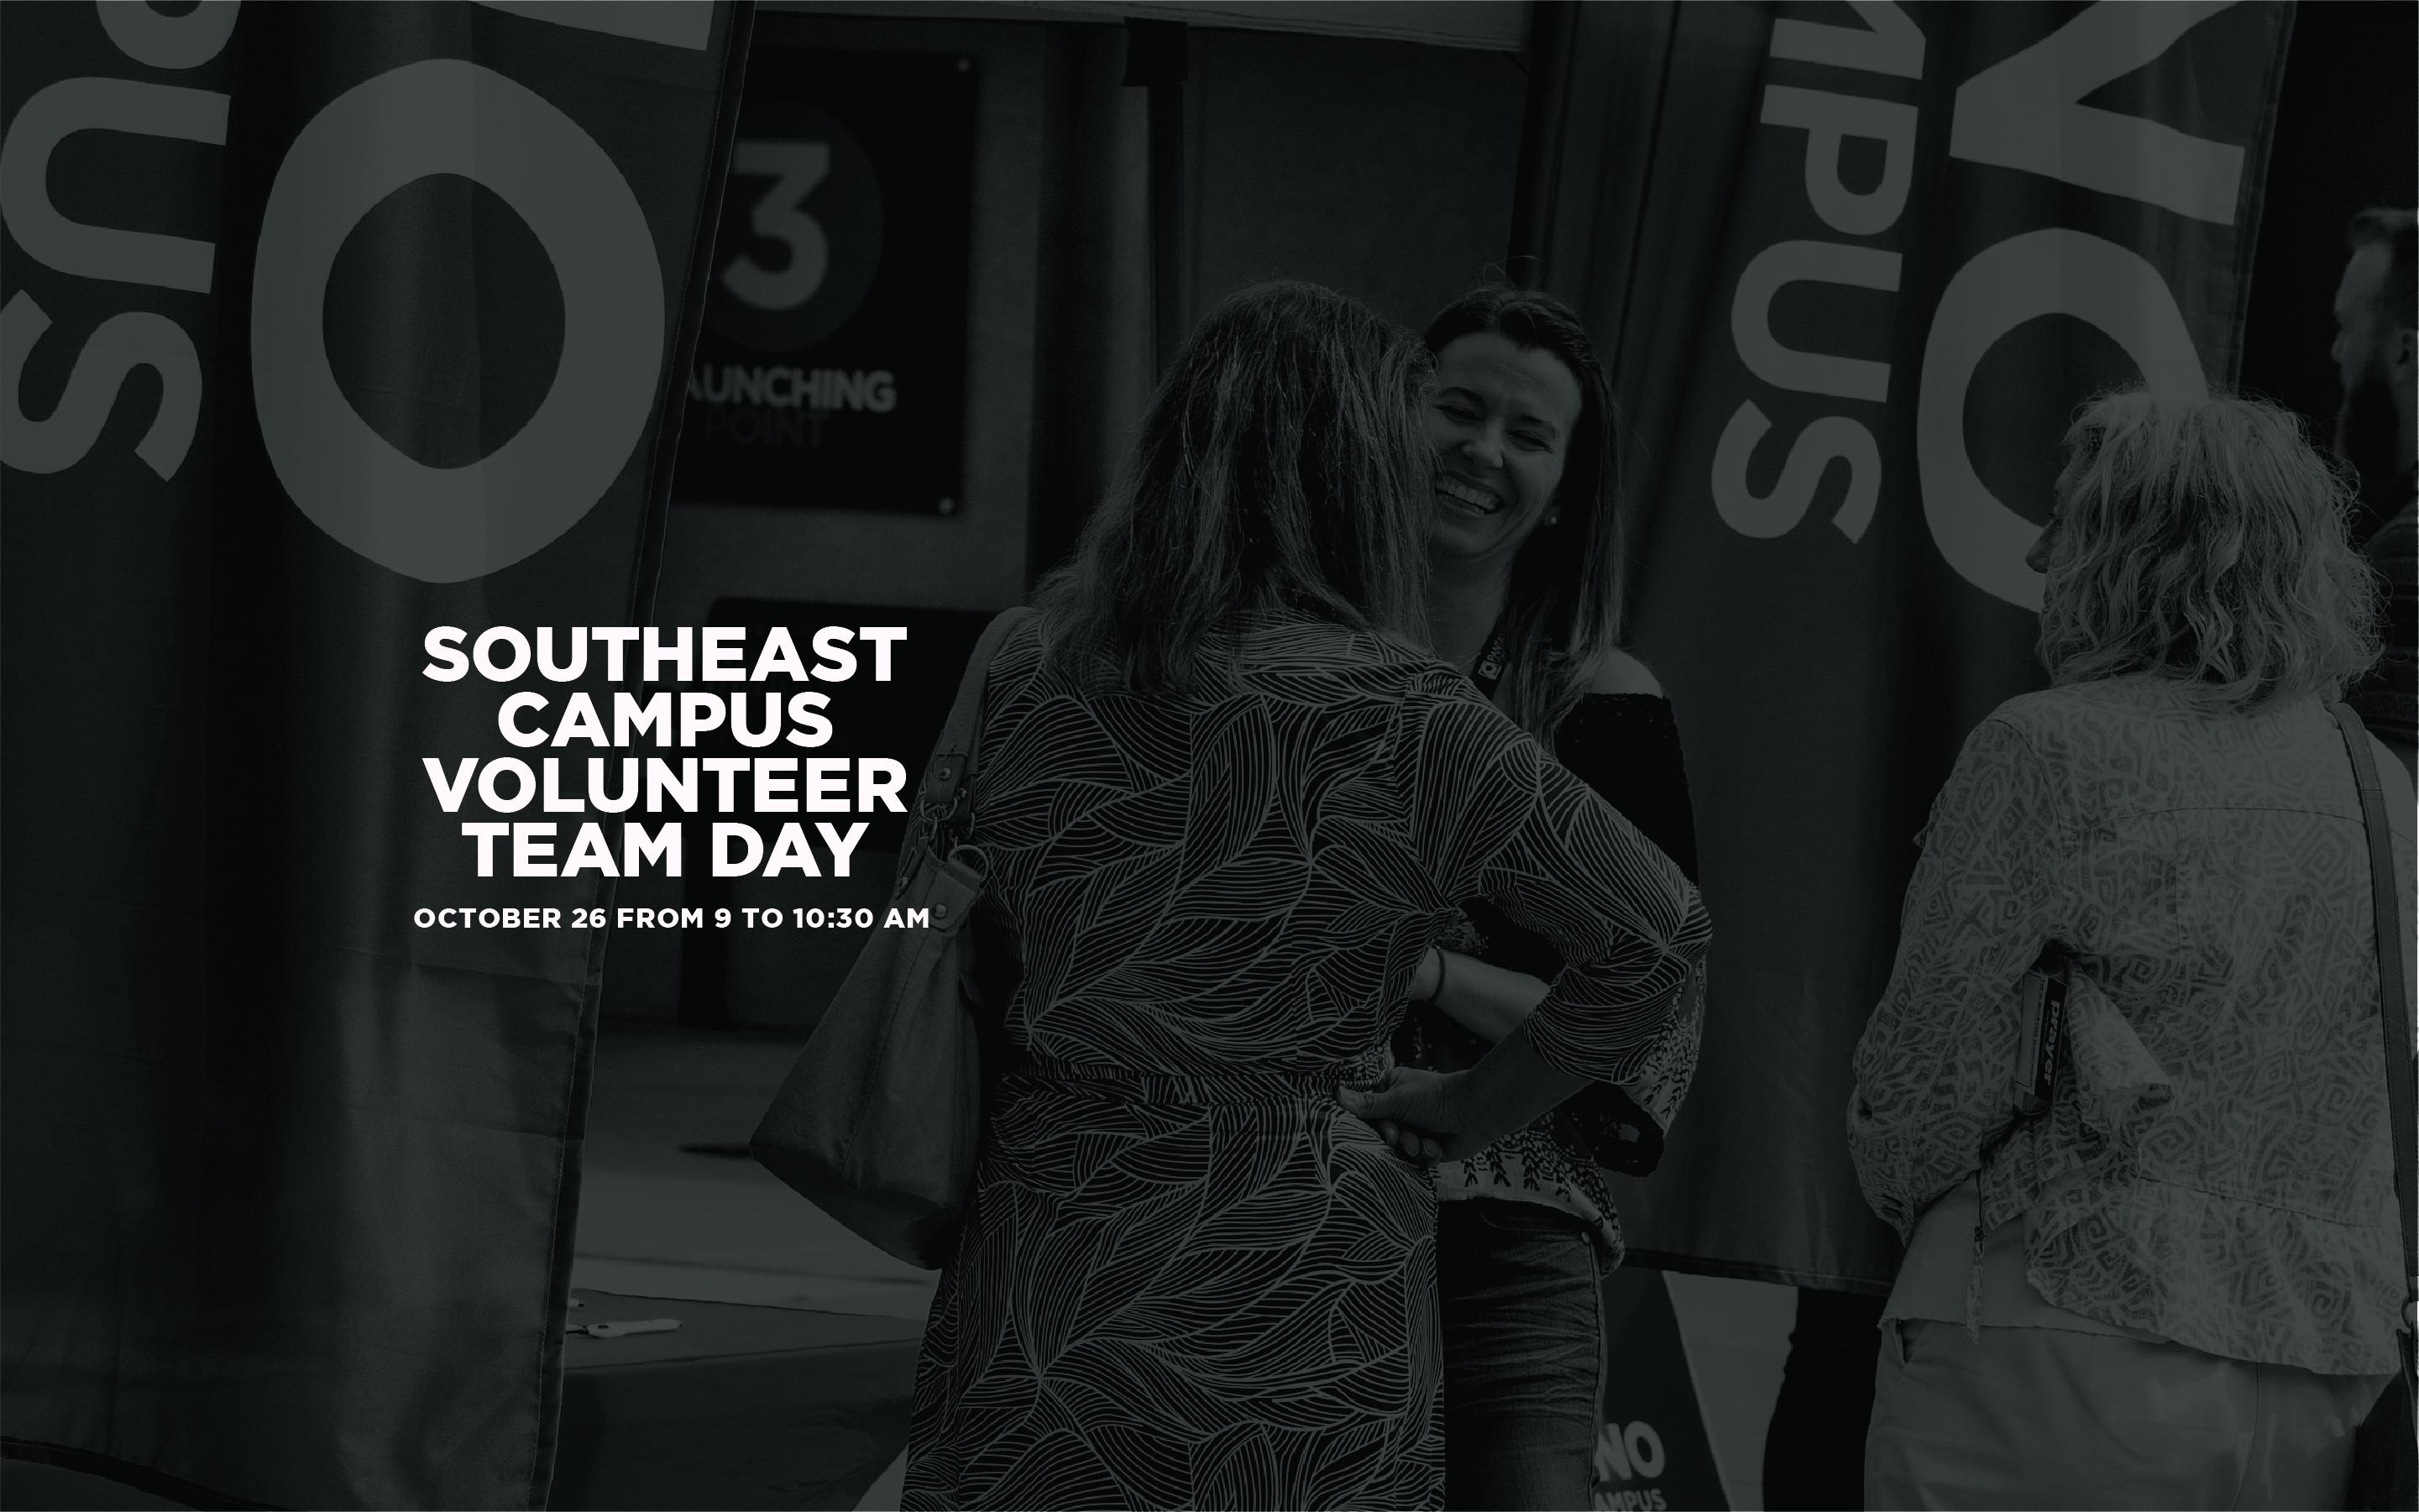 Image: Southeast Campus Volunteer Team Day